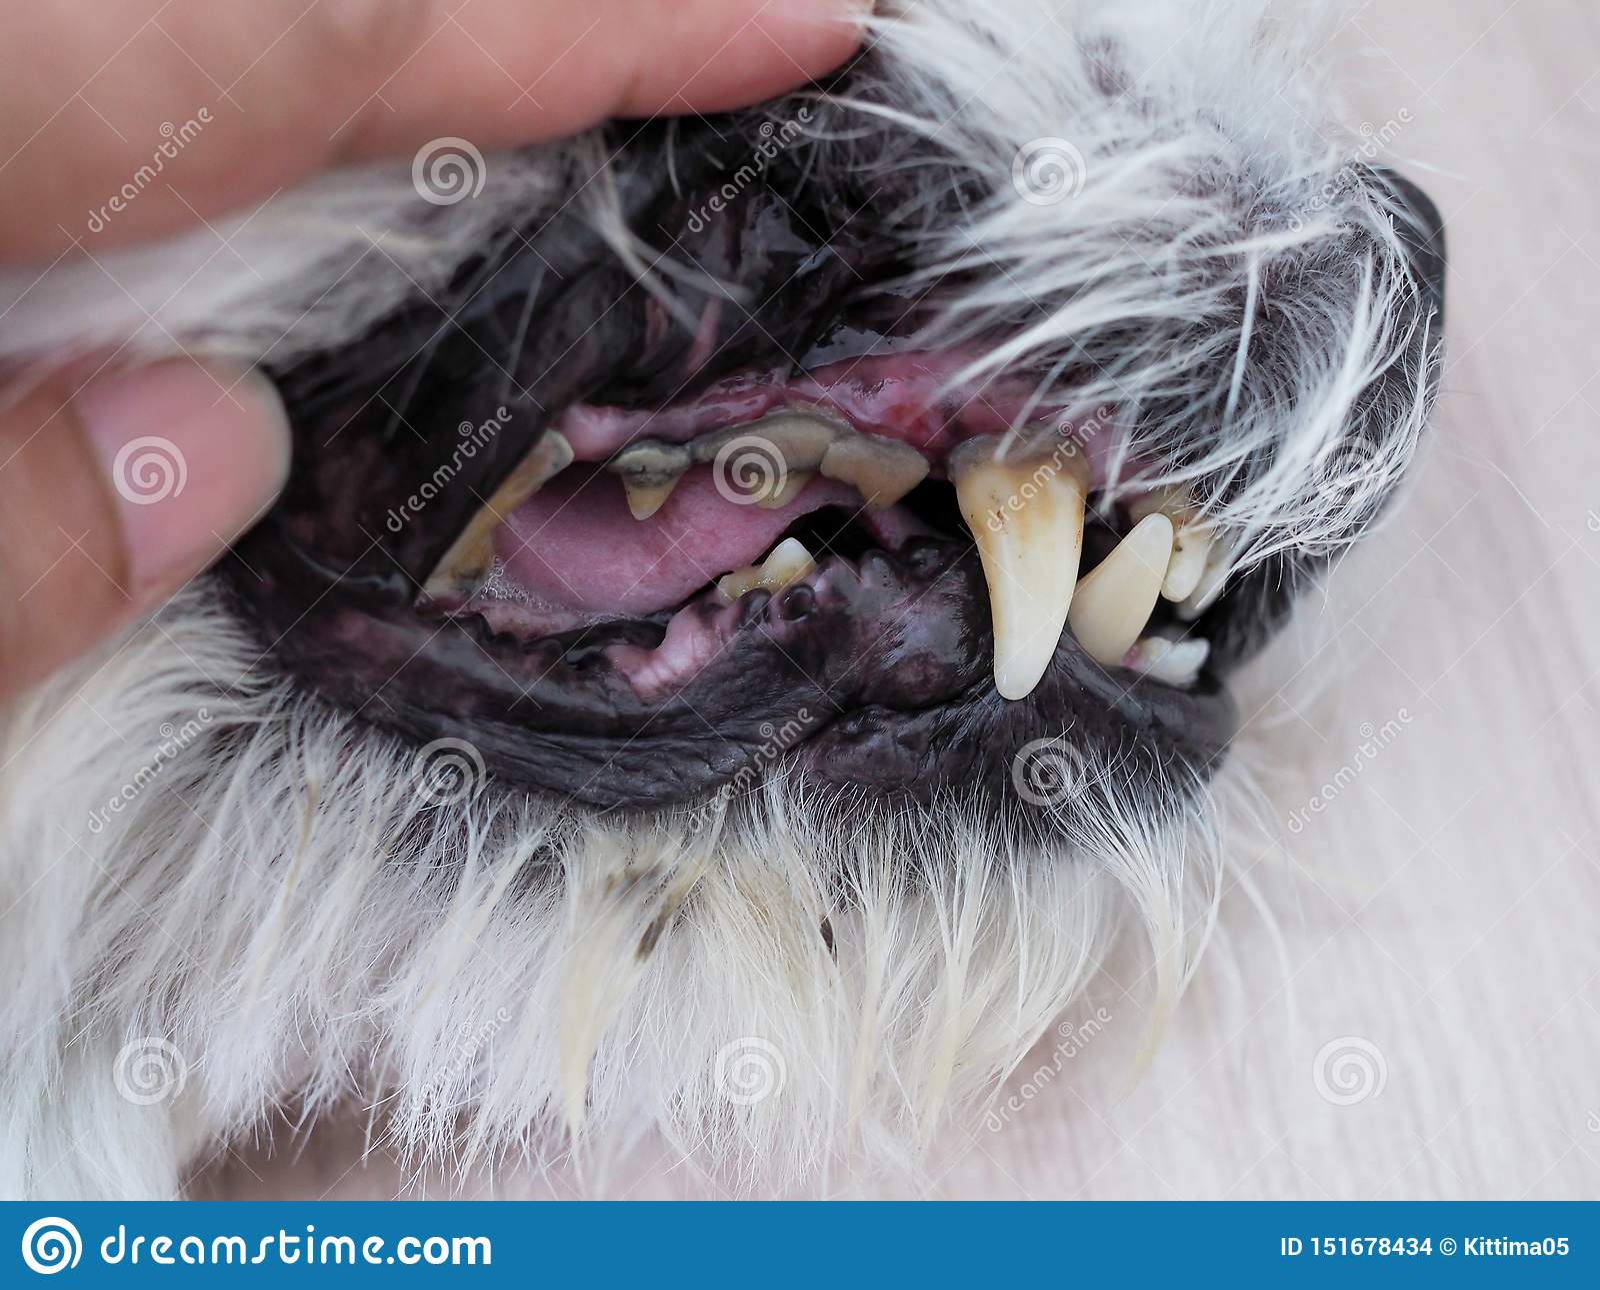 Здоровье с ртом Toothache собаки, спада зуба и пятен известняка